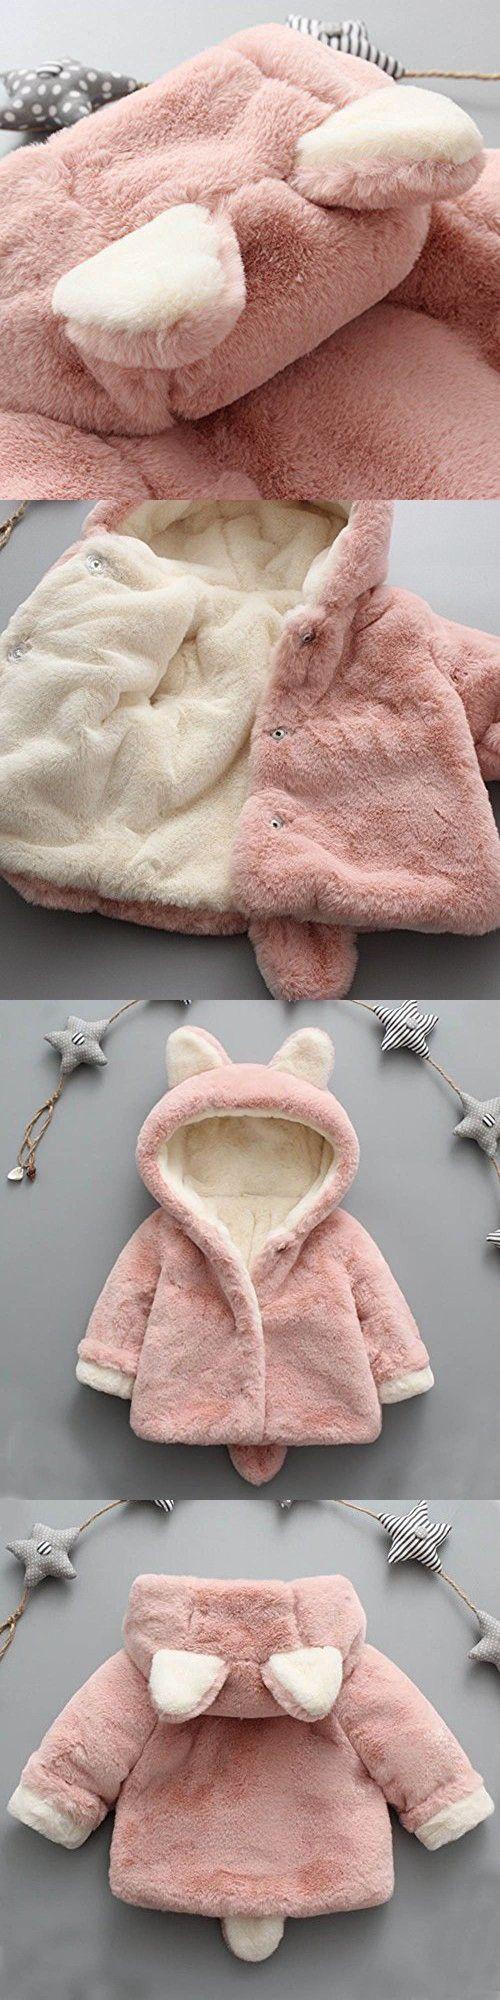 02e2d373a Fabal Baby Infant Girls Boys Autumn Winter Hooded Coat Cloak Jacket ...